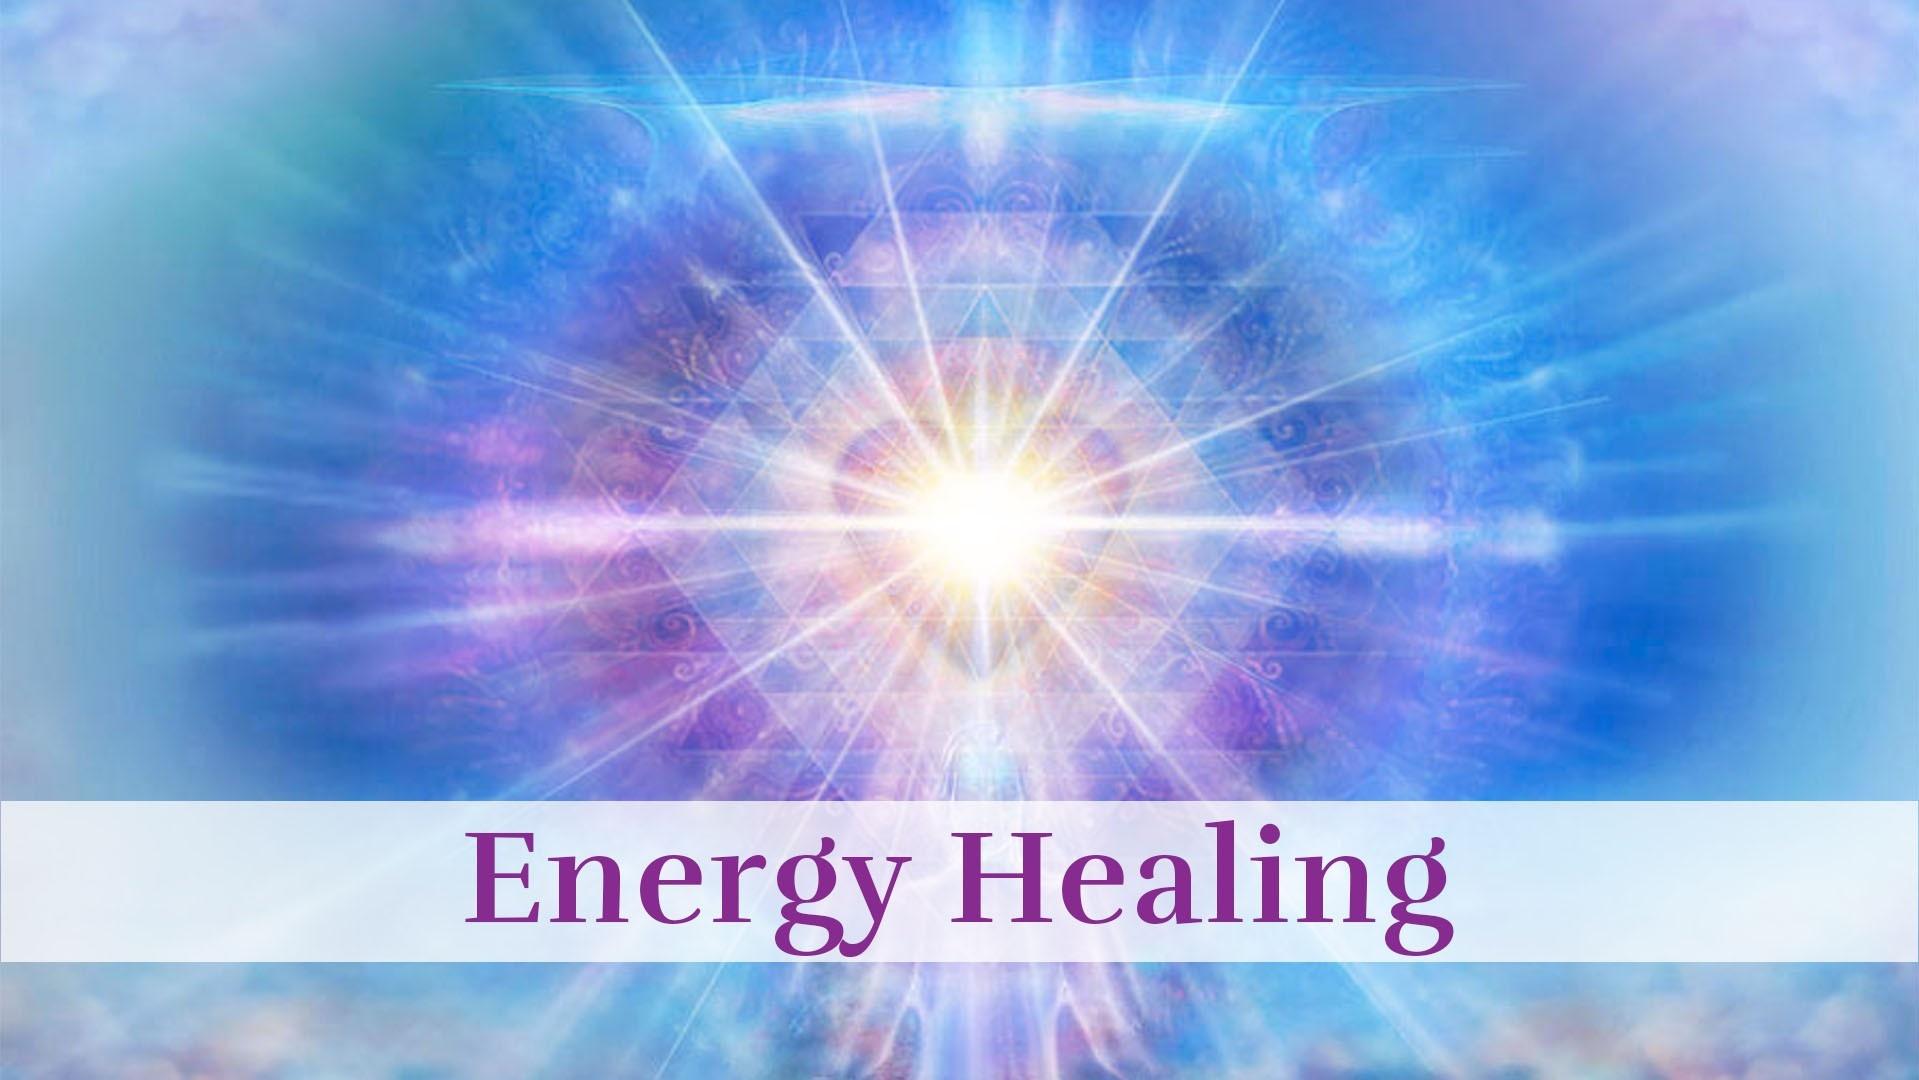 Energetic healing helps you make quantum leaps forward through trauma.